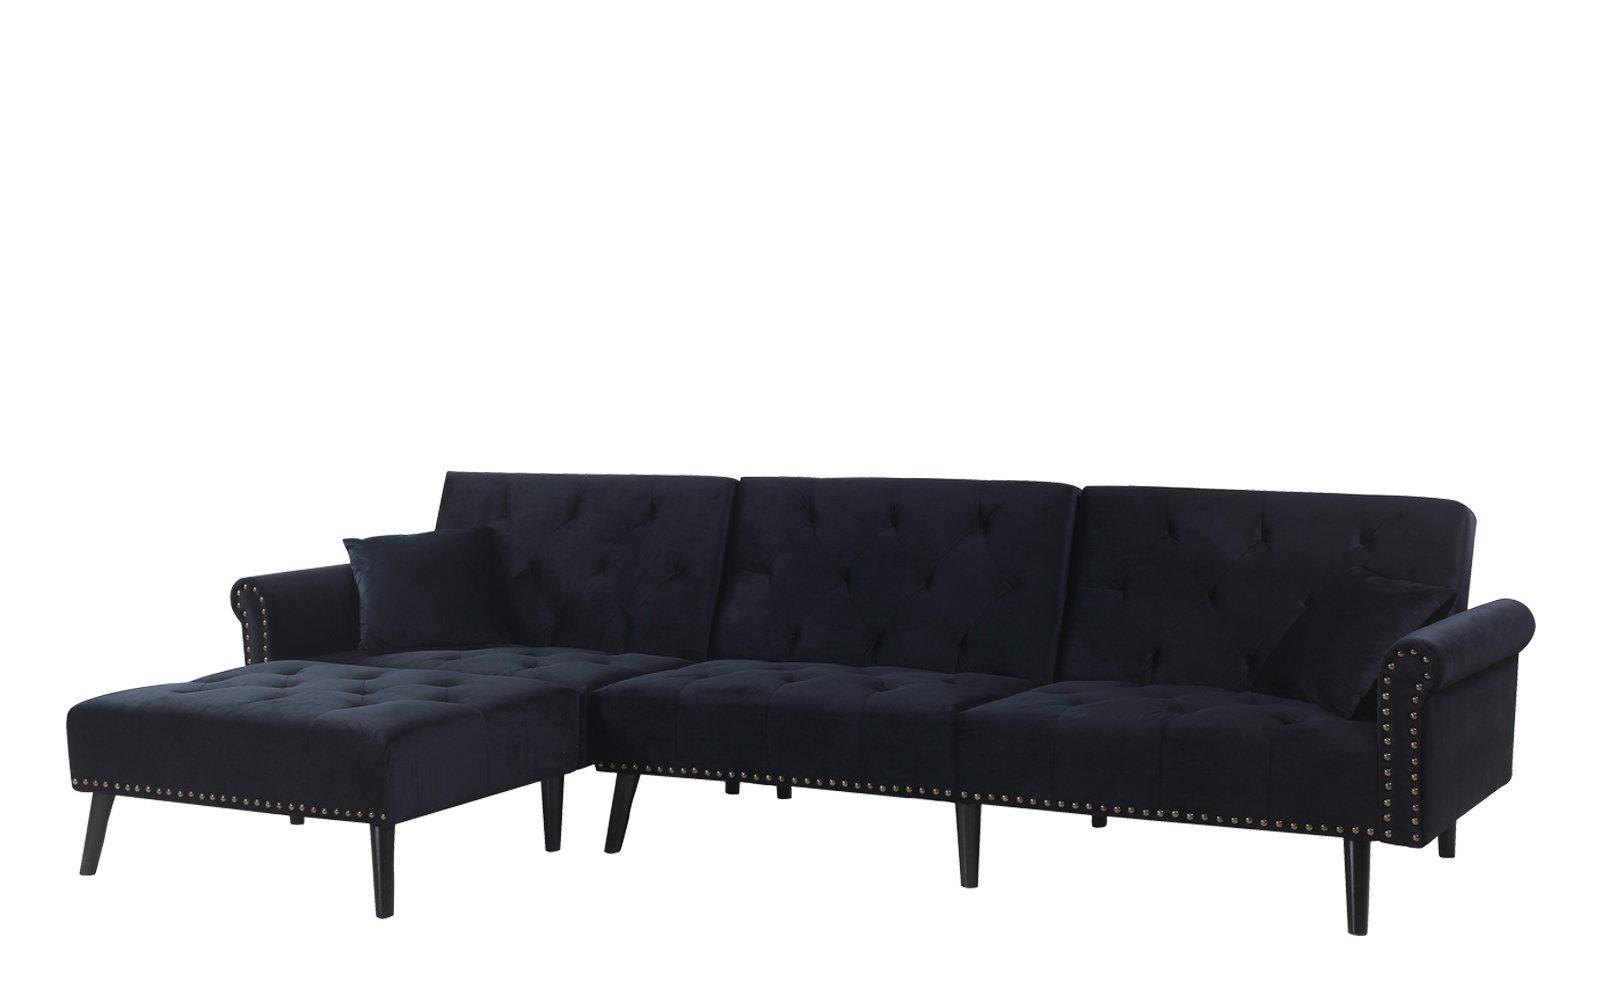 Fabulous Victoria Classic Velvet Nailhead Trim Sleeper Sofa With Left Forskolin Free Trial Chair Design Images Forskolin Free Trialorg